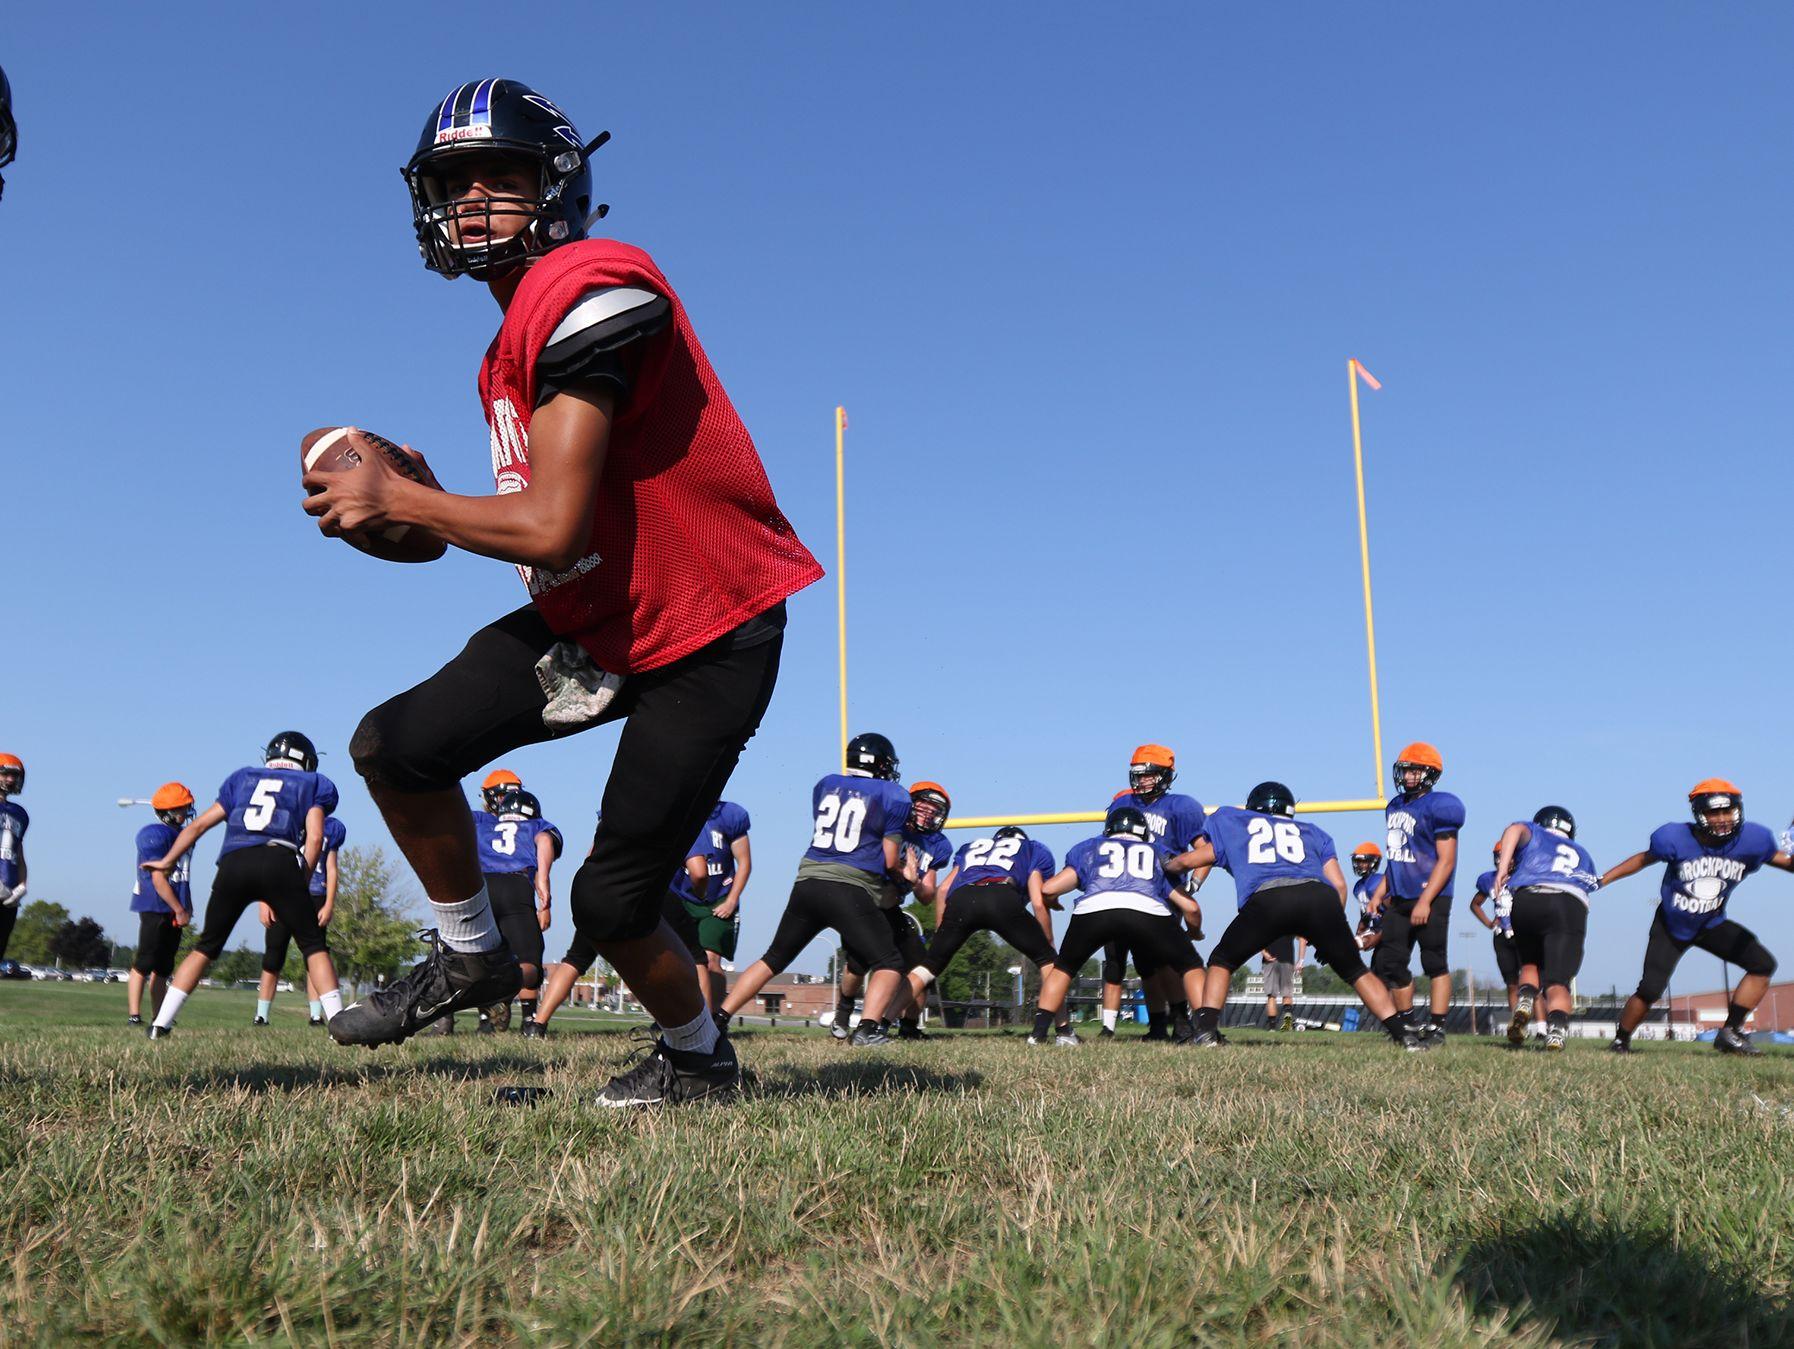 Brockport High School quarterback Ashton Scott rolls back during the team's practice.